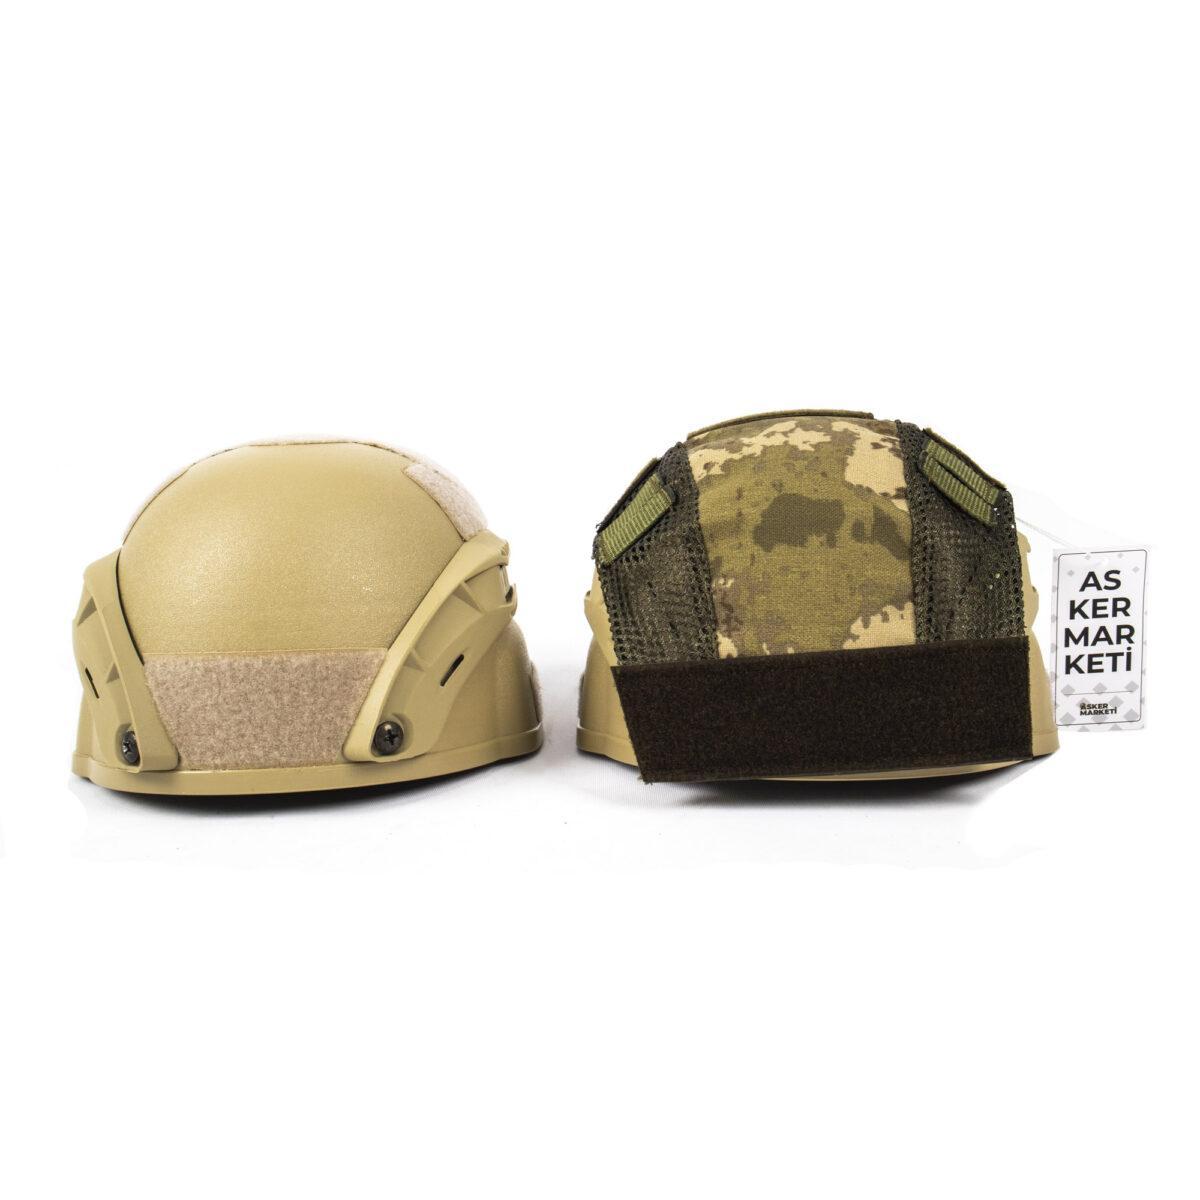 yeni tsk kamuflaj kask kilifi kisa askeri malzeme